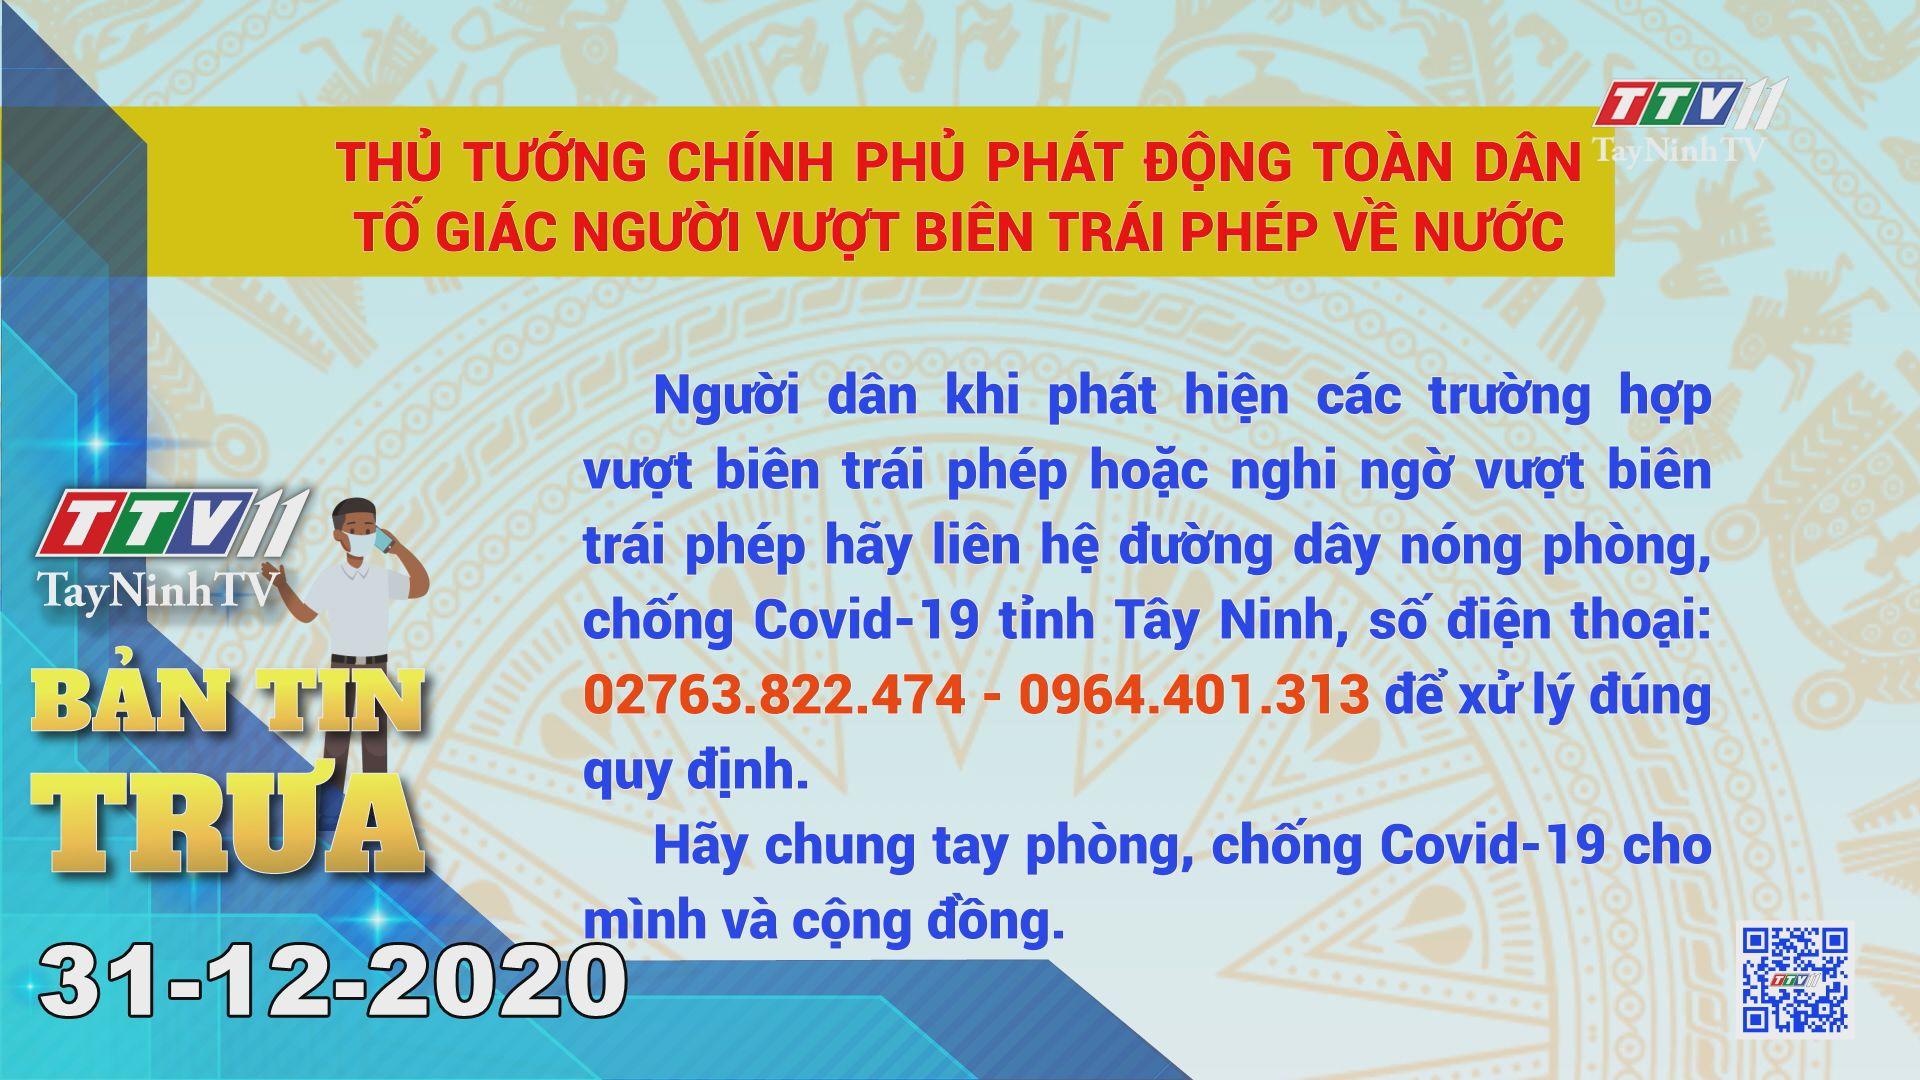 Bản tin trưa 31-12-2020 | Tin tức hôm nay | TayNinhTV